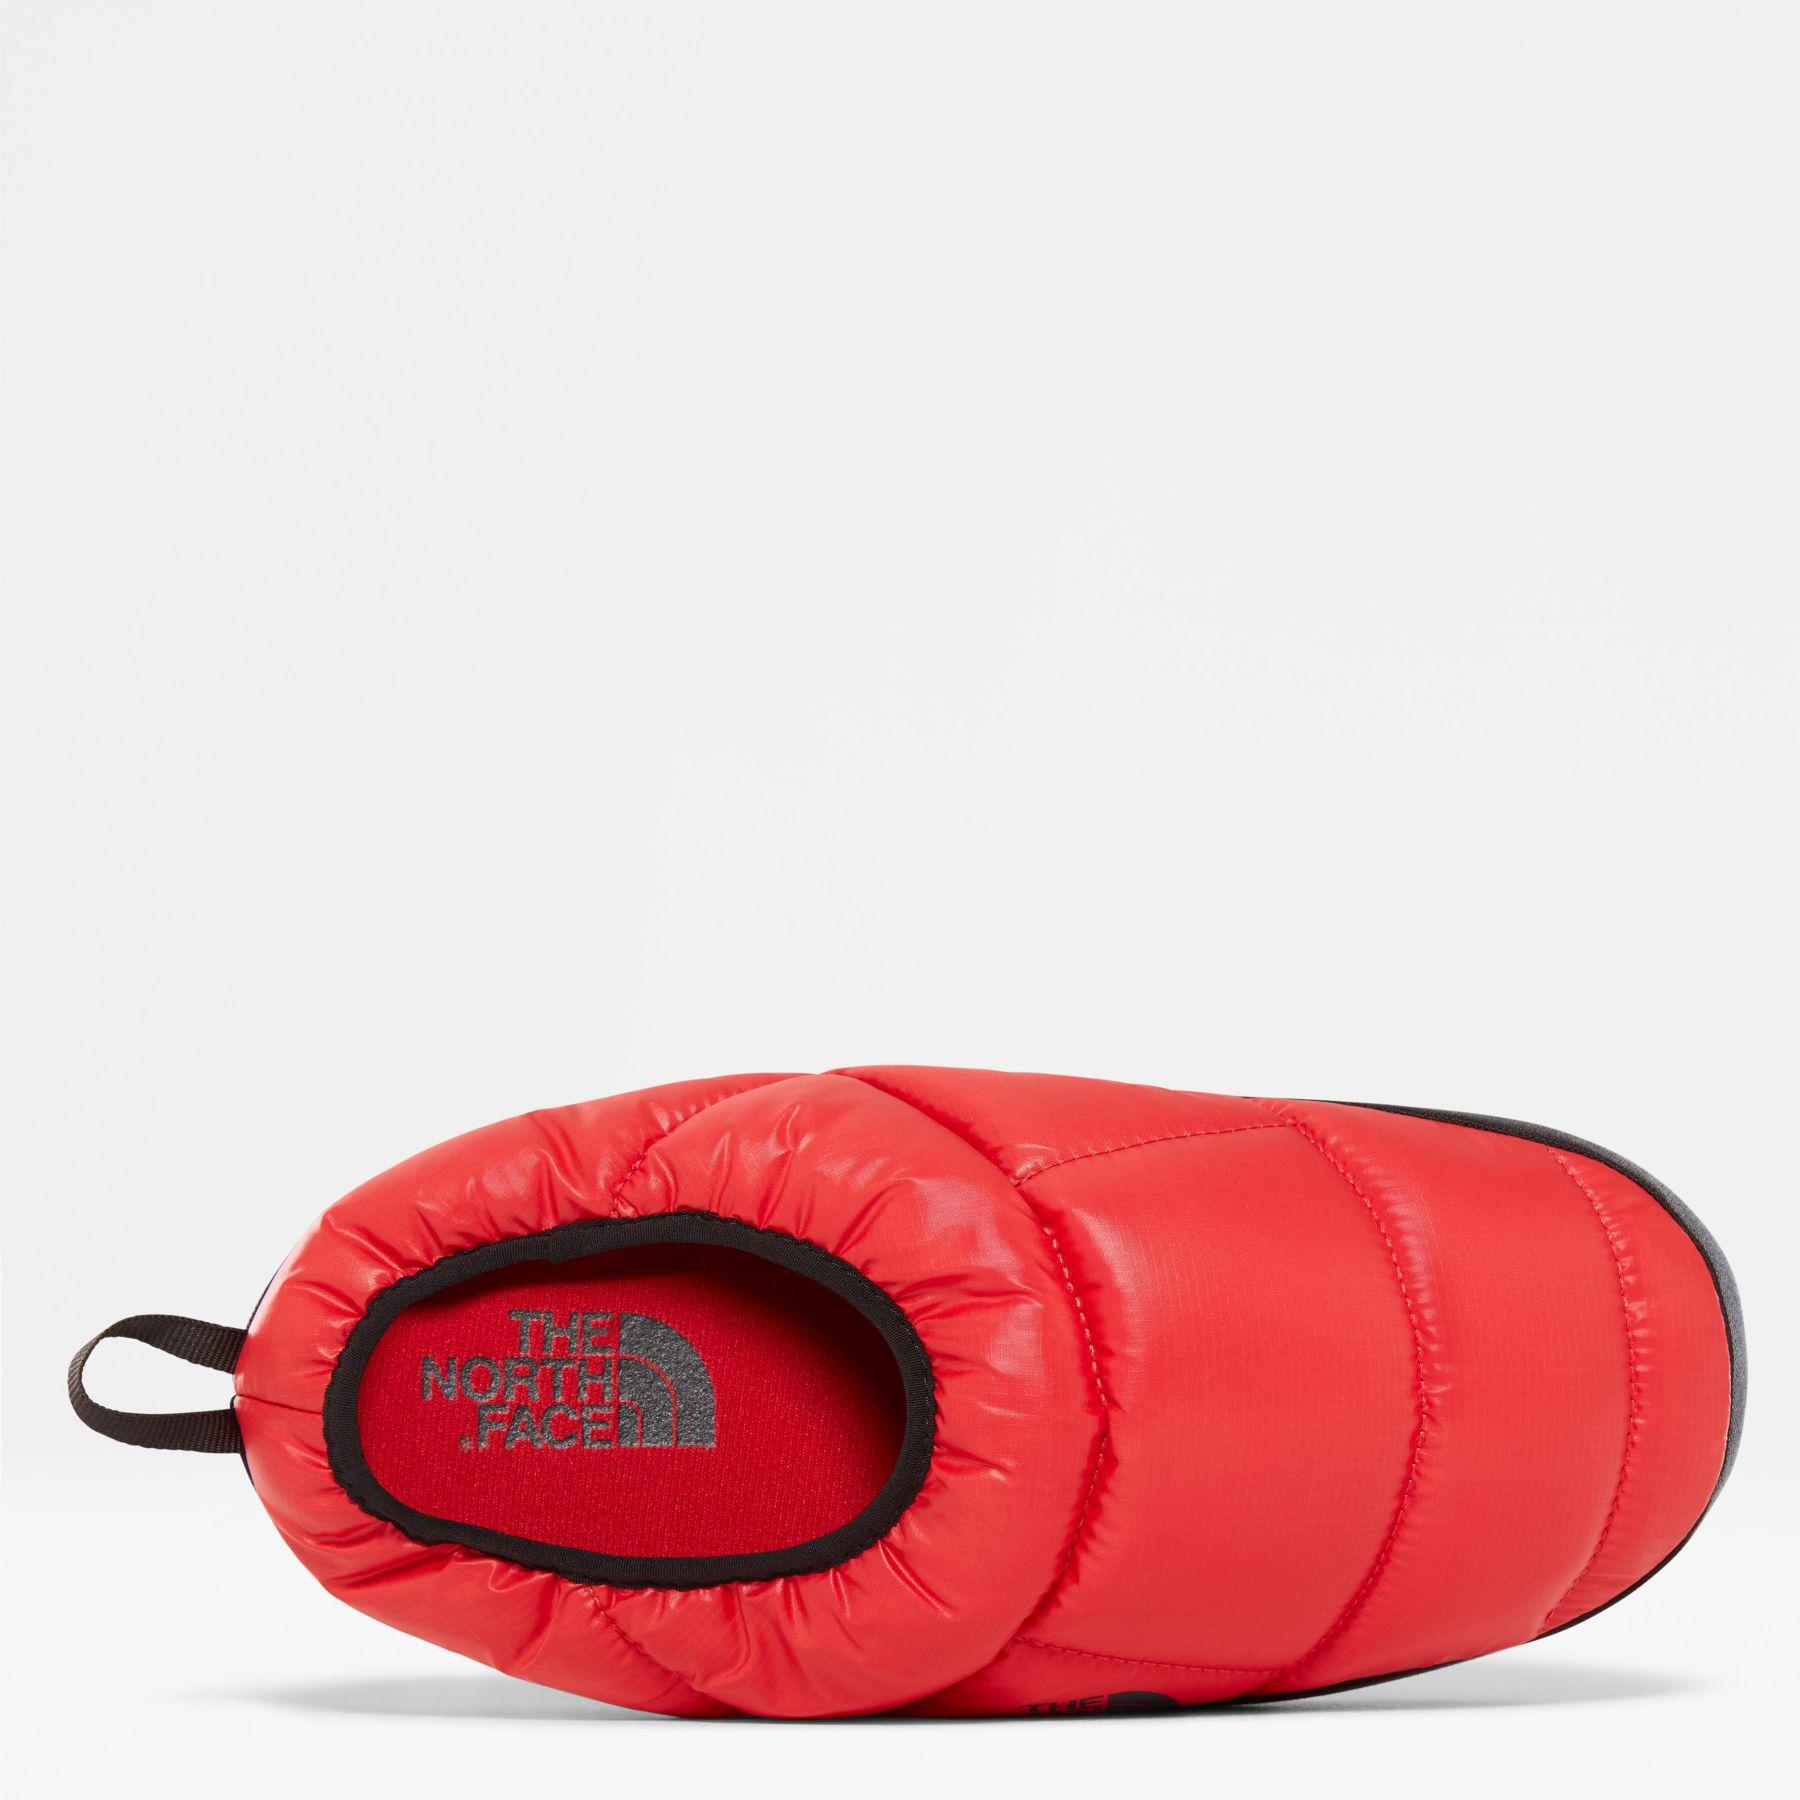 Pantofole Uomo NSE Tent III THE NORTH FACE - Himalaya Trek 6e5bc6c1a1c2